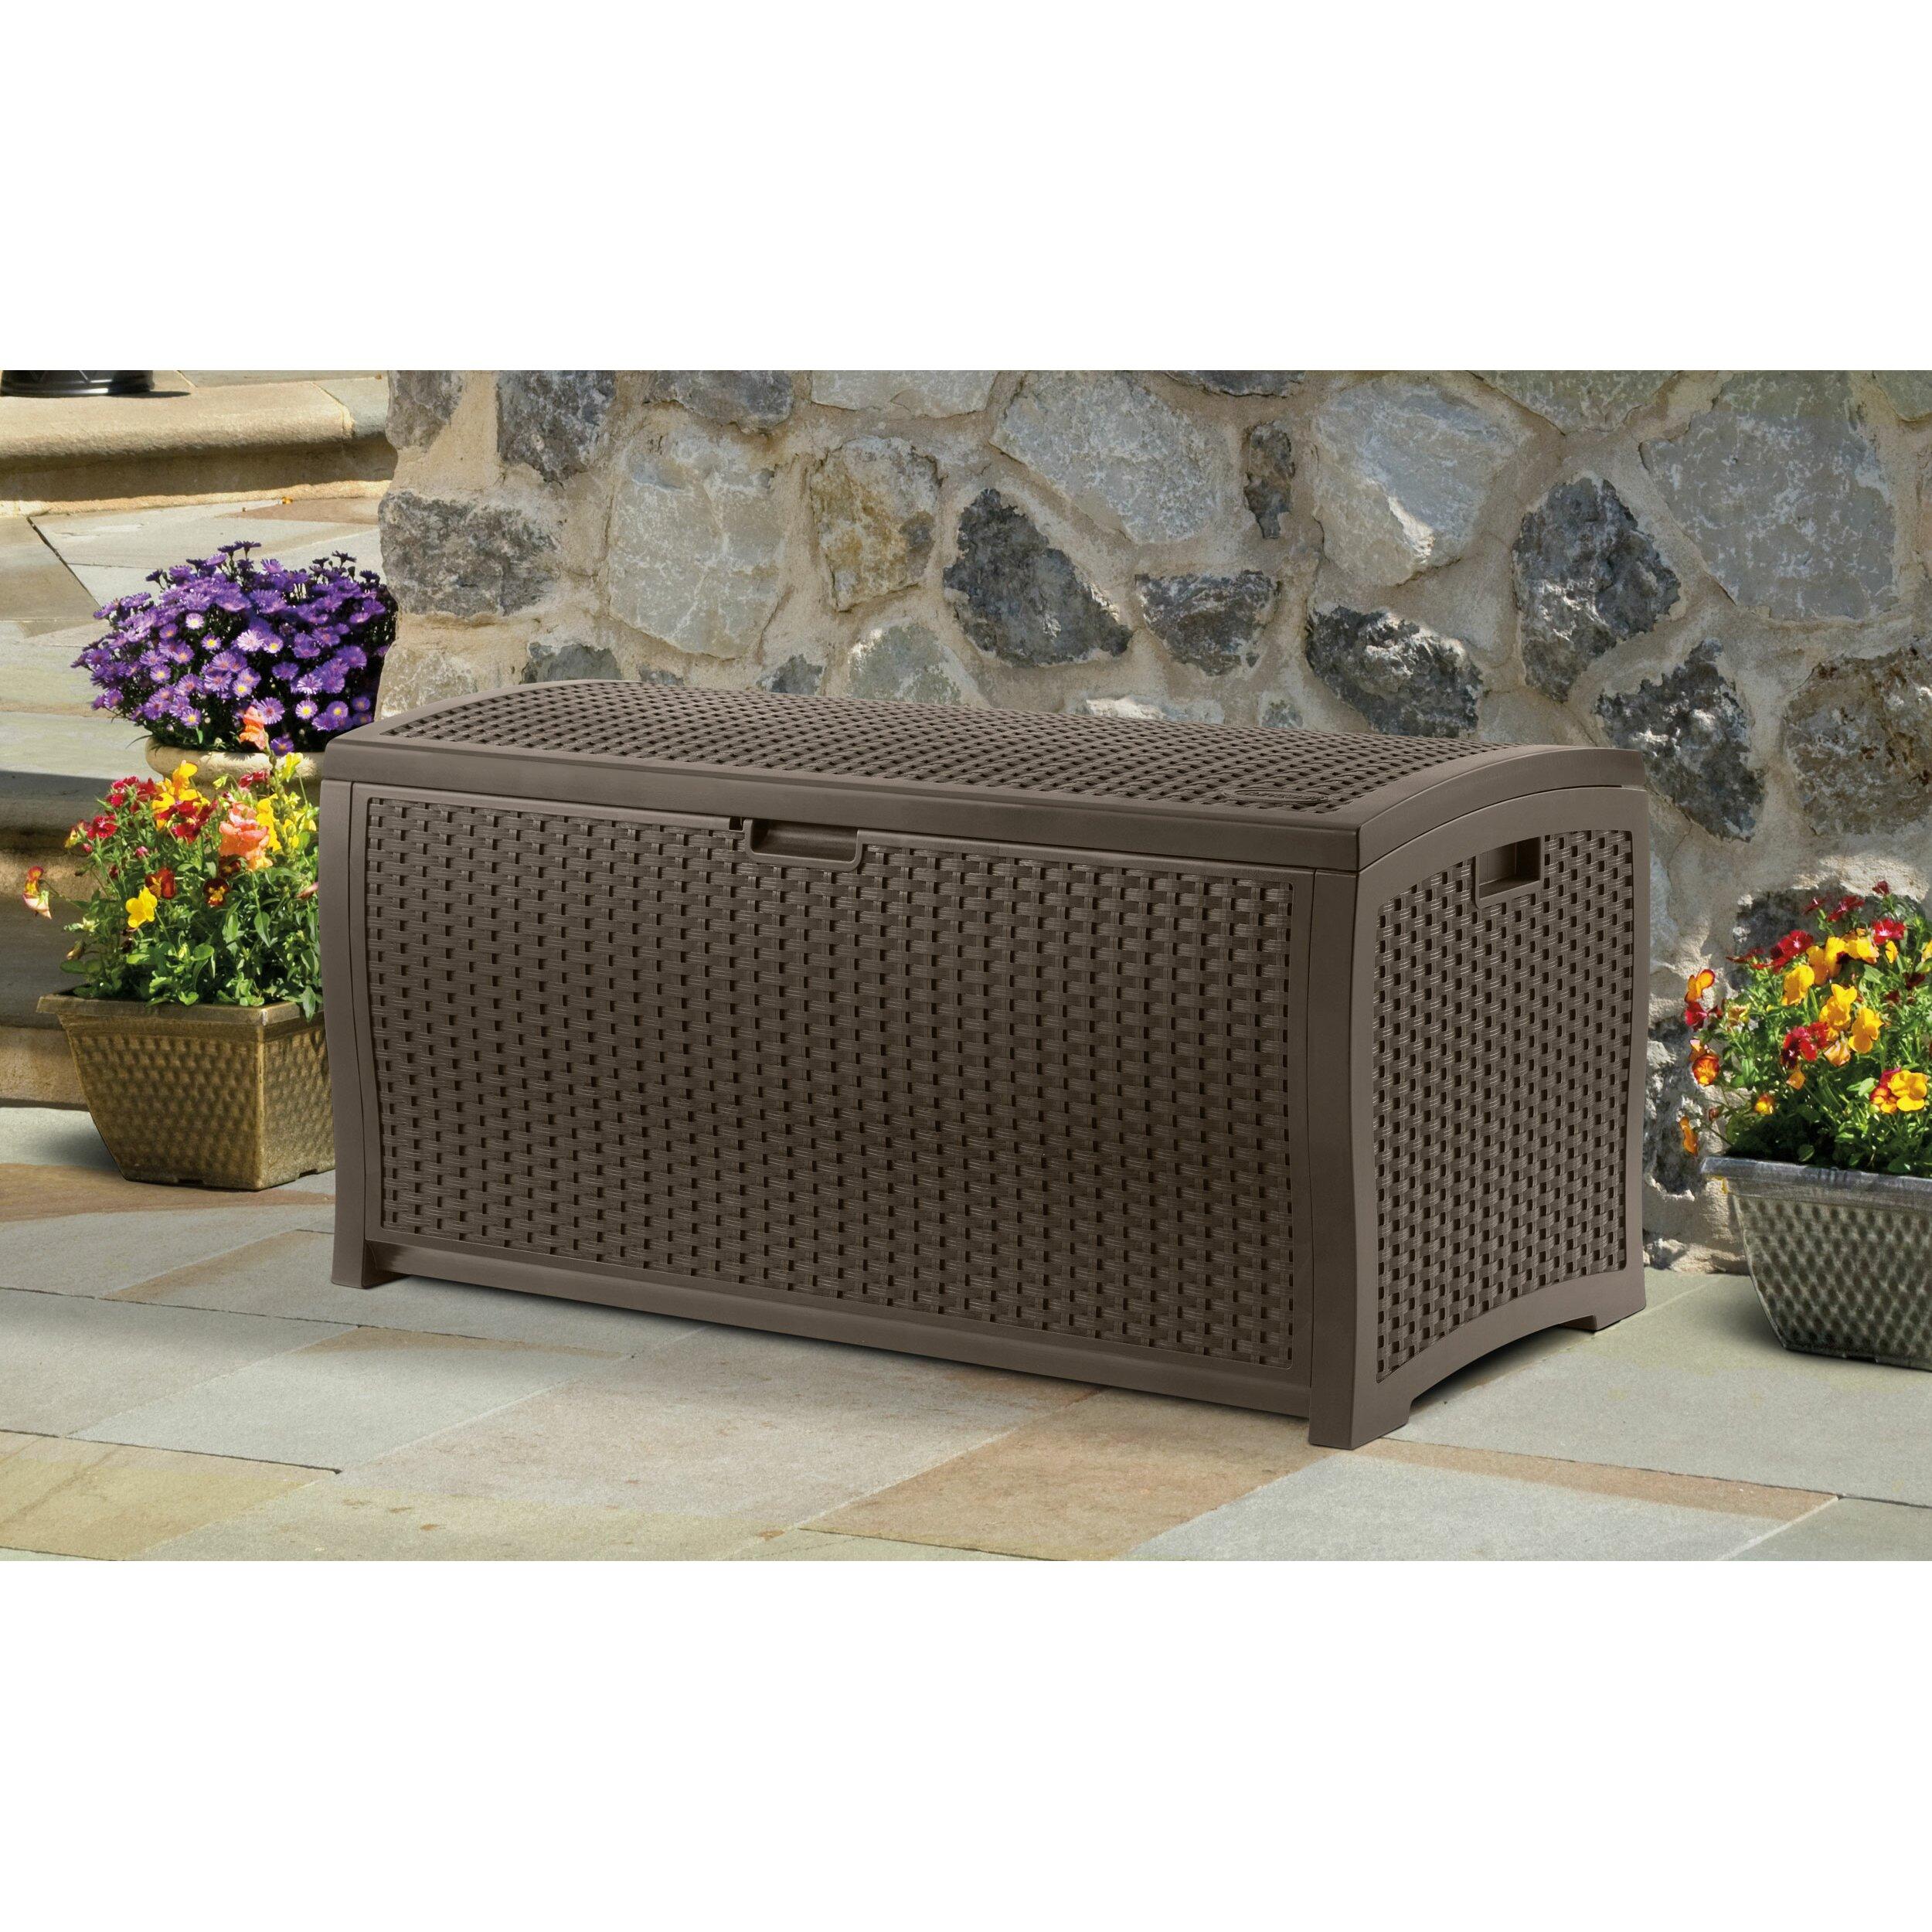 georgious outdoor cushion storage closet roselawnlutheran